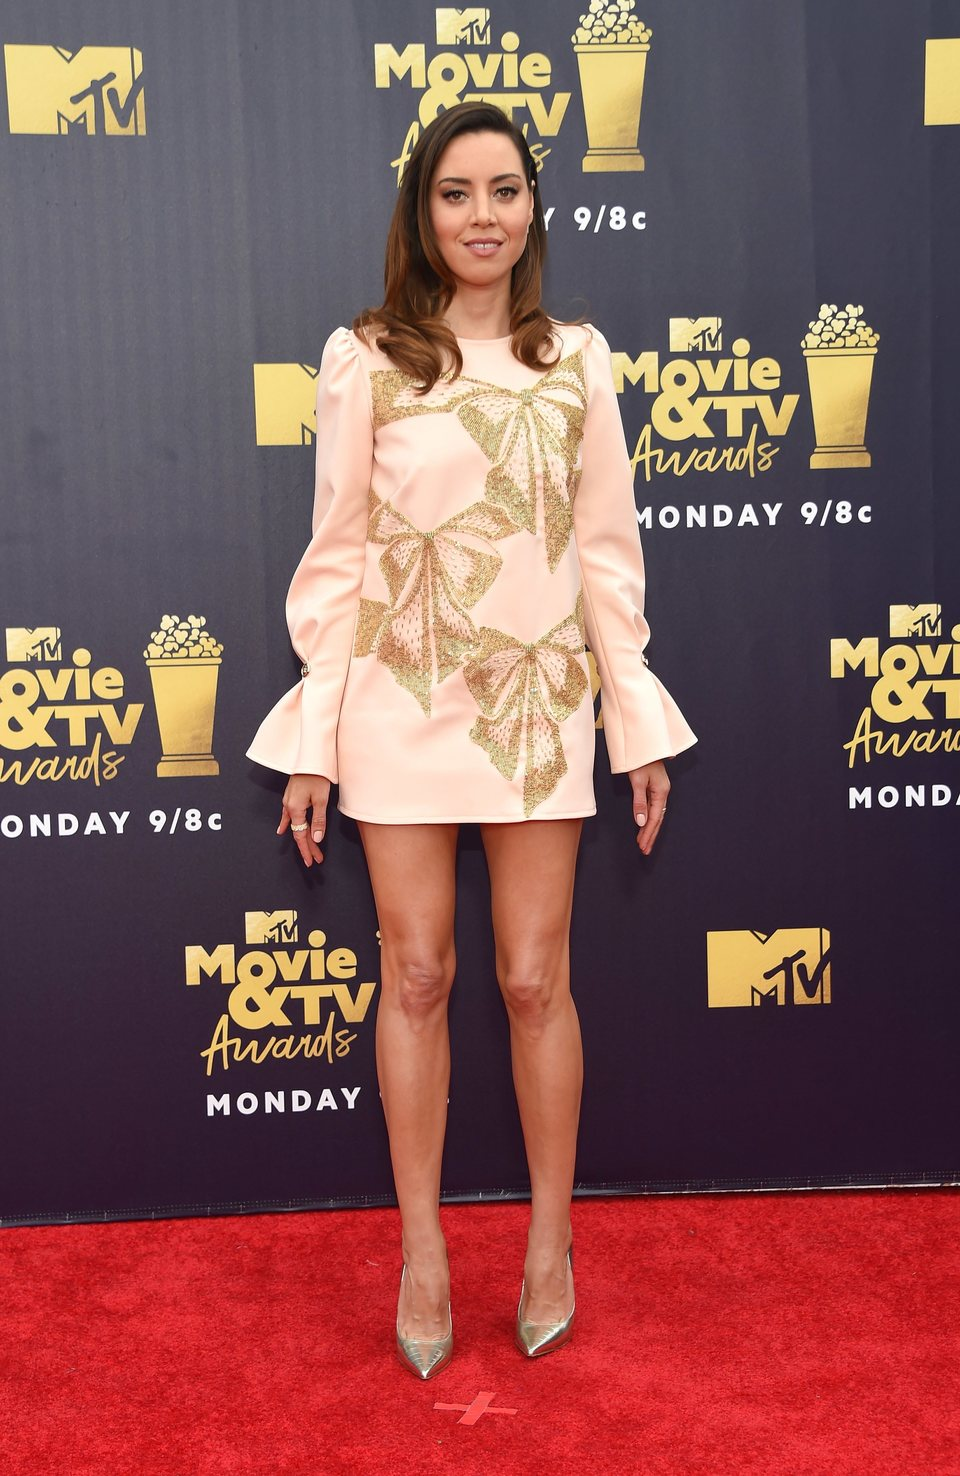 Aubrey Plaza At The Mtv Movie Tv Awards 2018 Red Carpet Photos